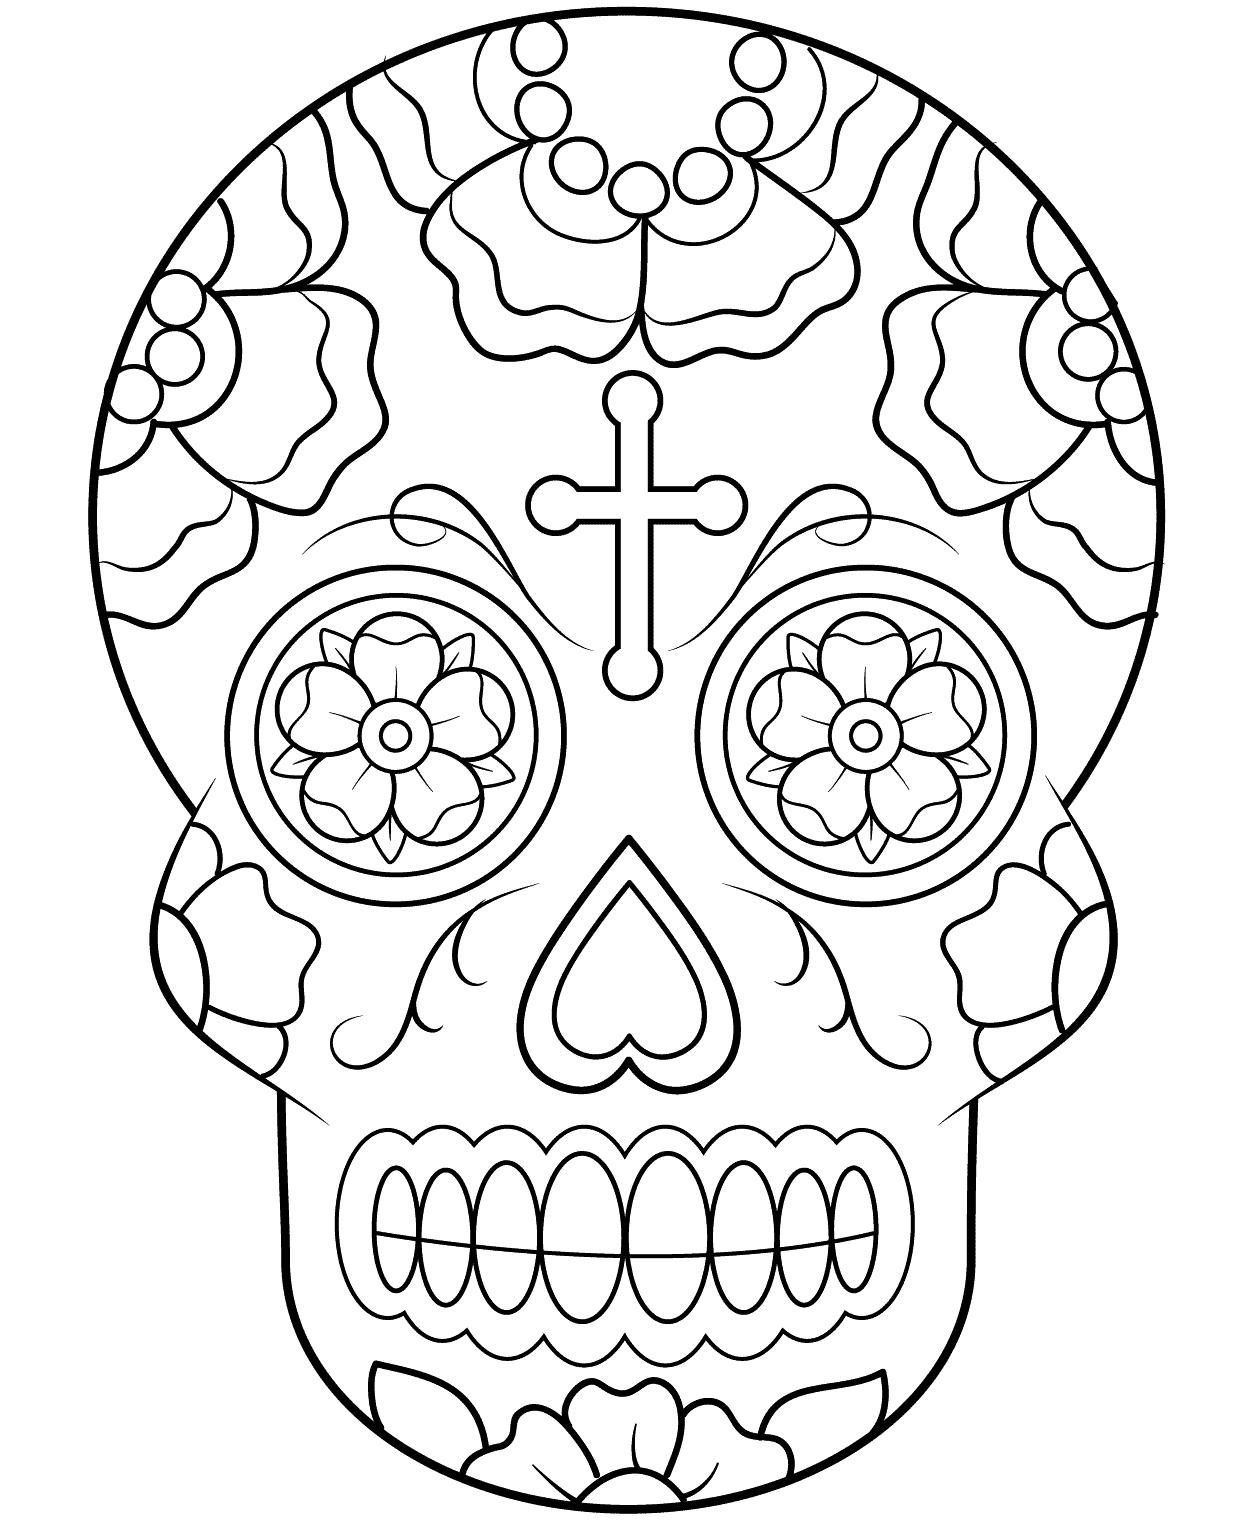 Easy Sugar Skull Drawings Tumblr Sketch Coloring Page